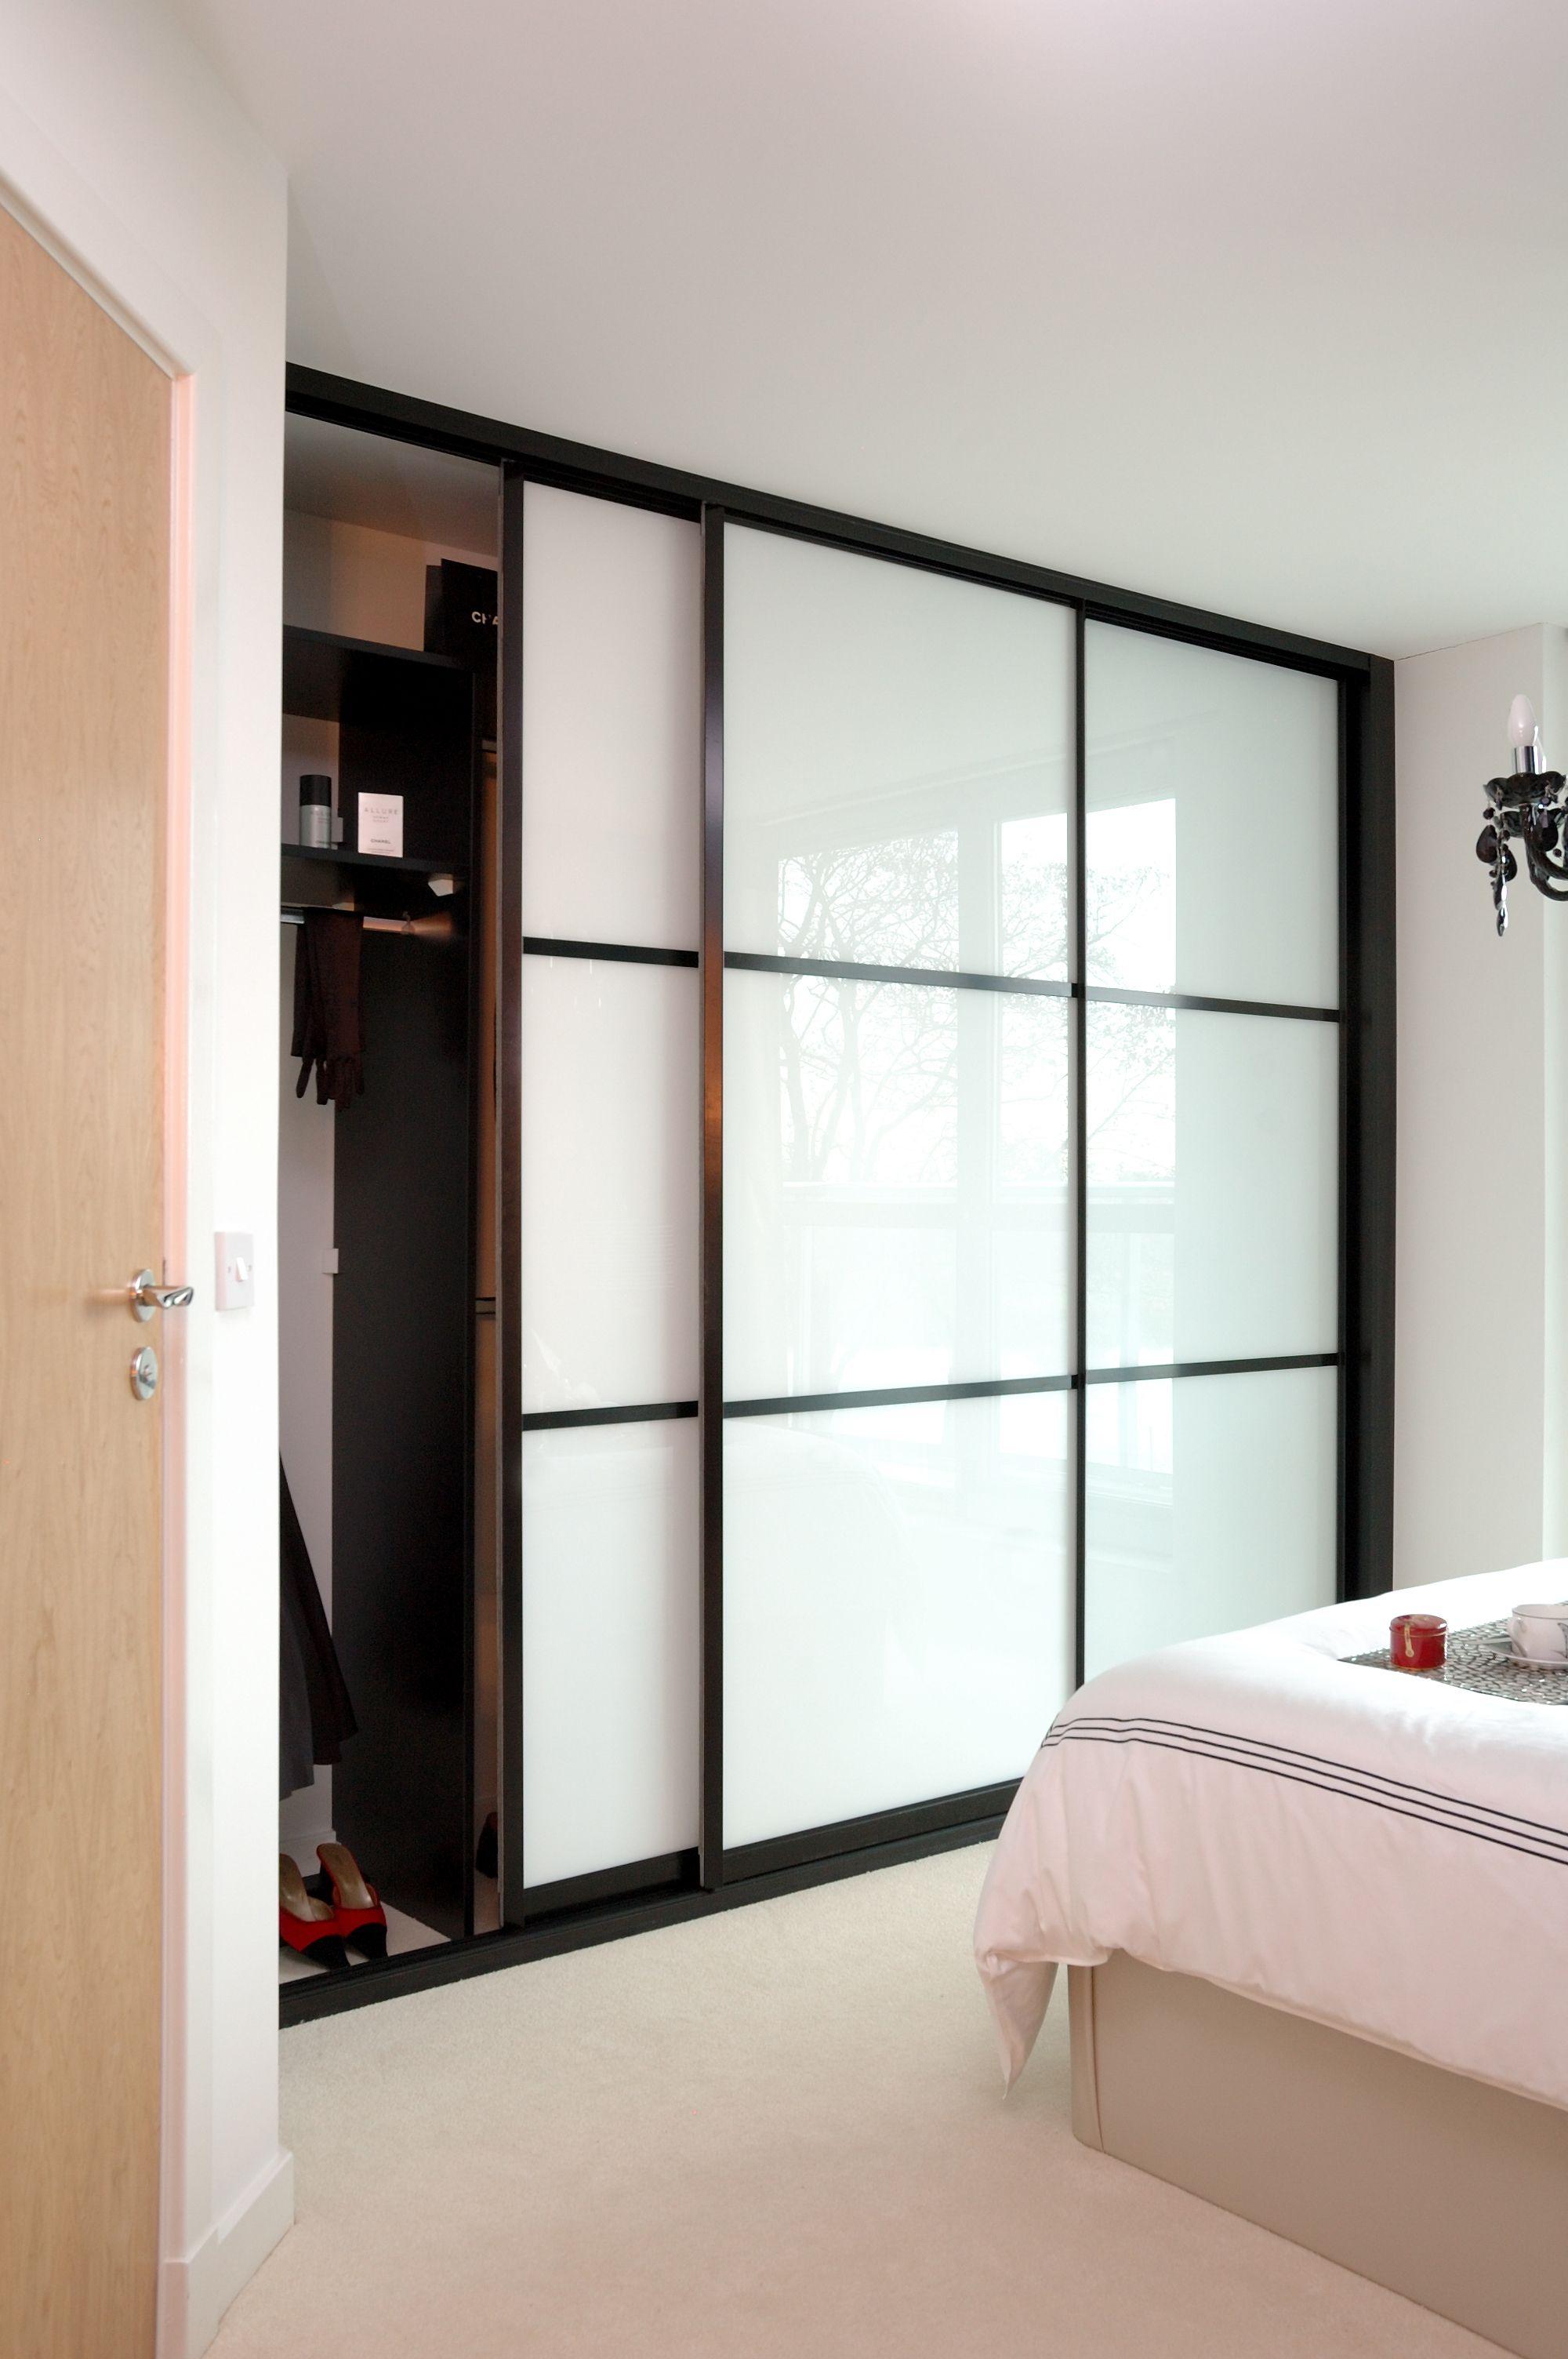 Bespoke Wardrobe Design Sliding Wardrobe Doors Wardrobe Doors Wardrobe Door Designs